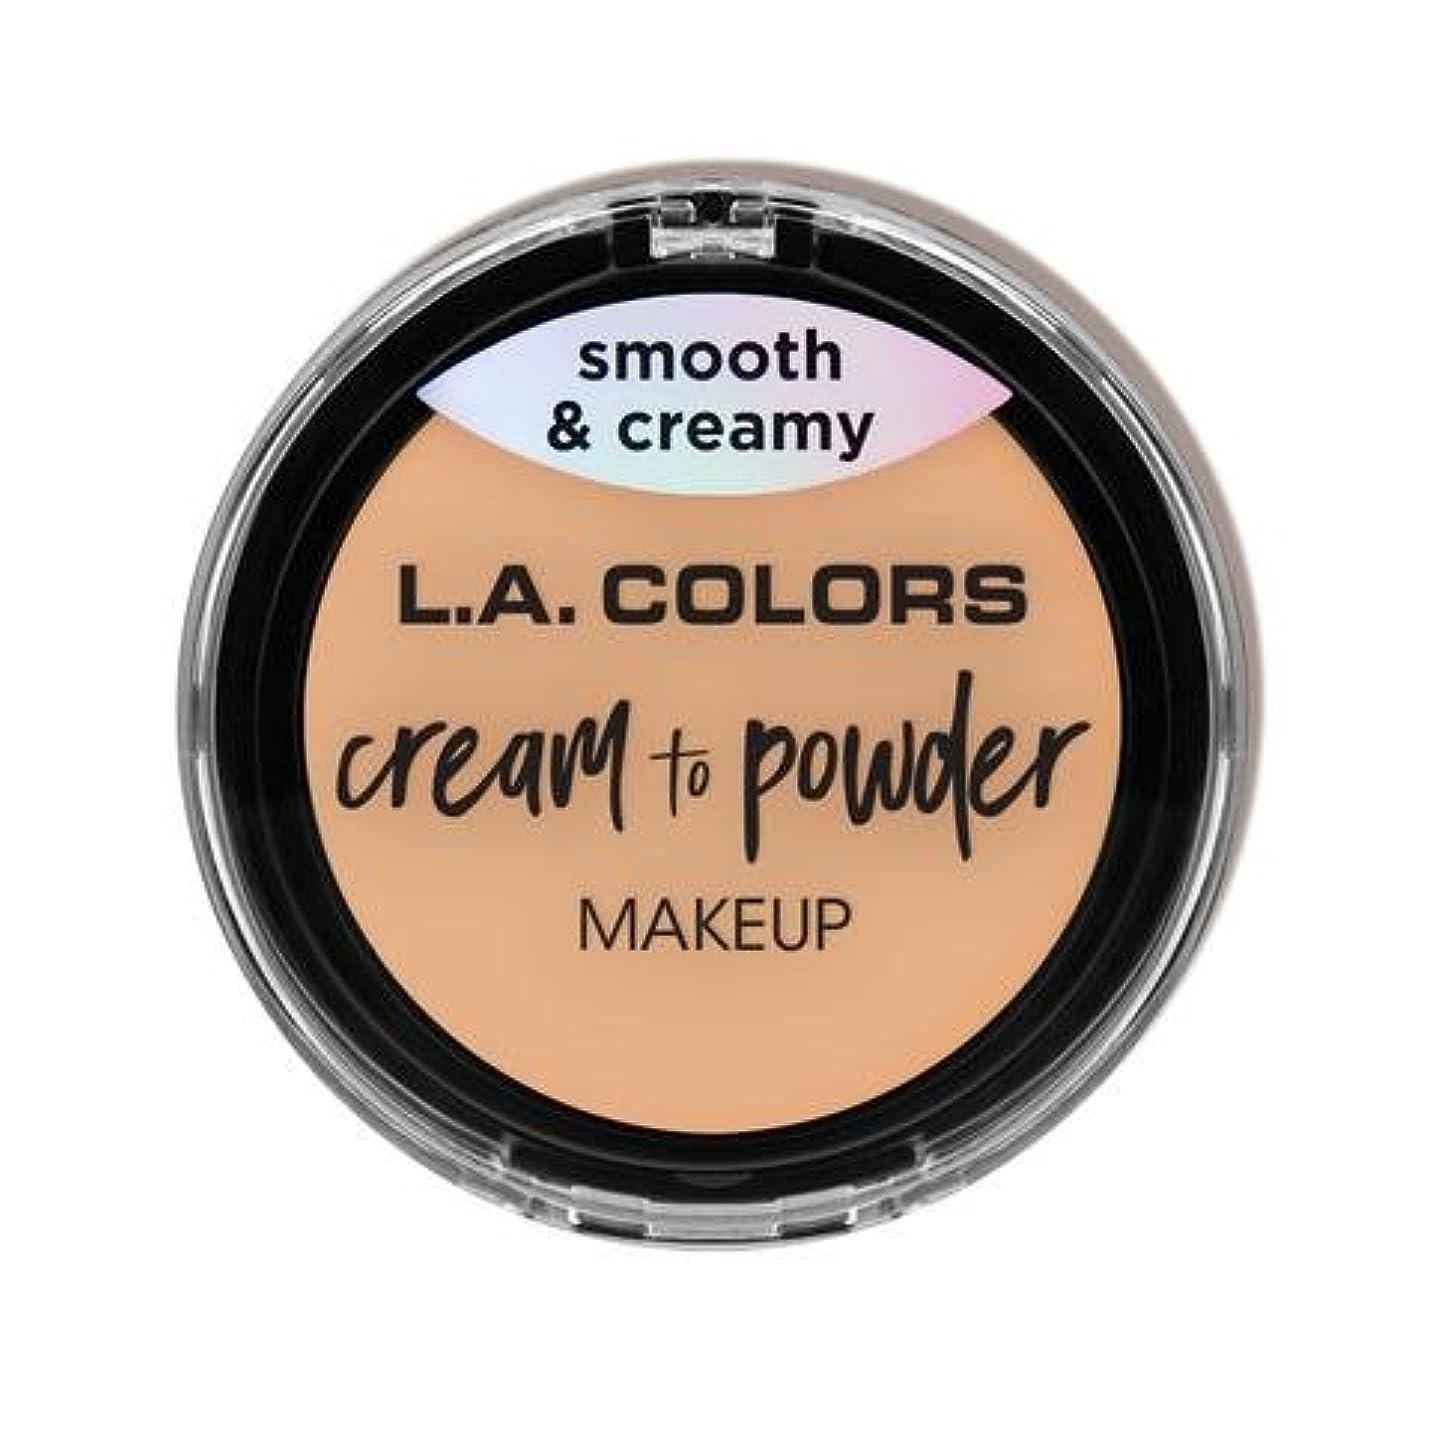 最高感謝祭読者(3 Pack) L.A. COLORS Cream To Powder Foundation - Buff (並行輸入品)